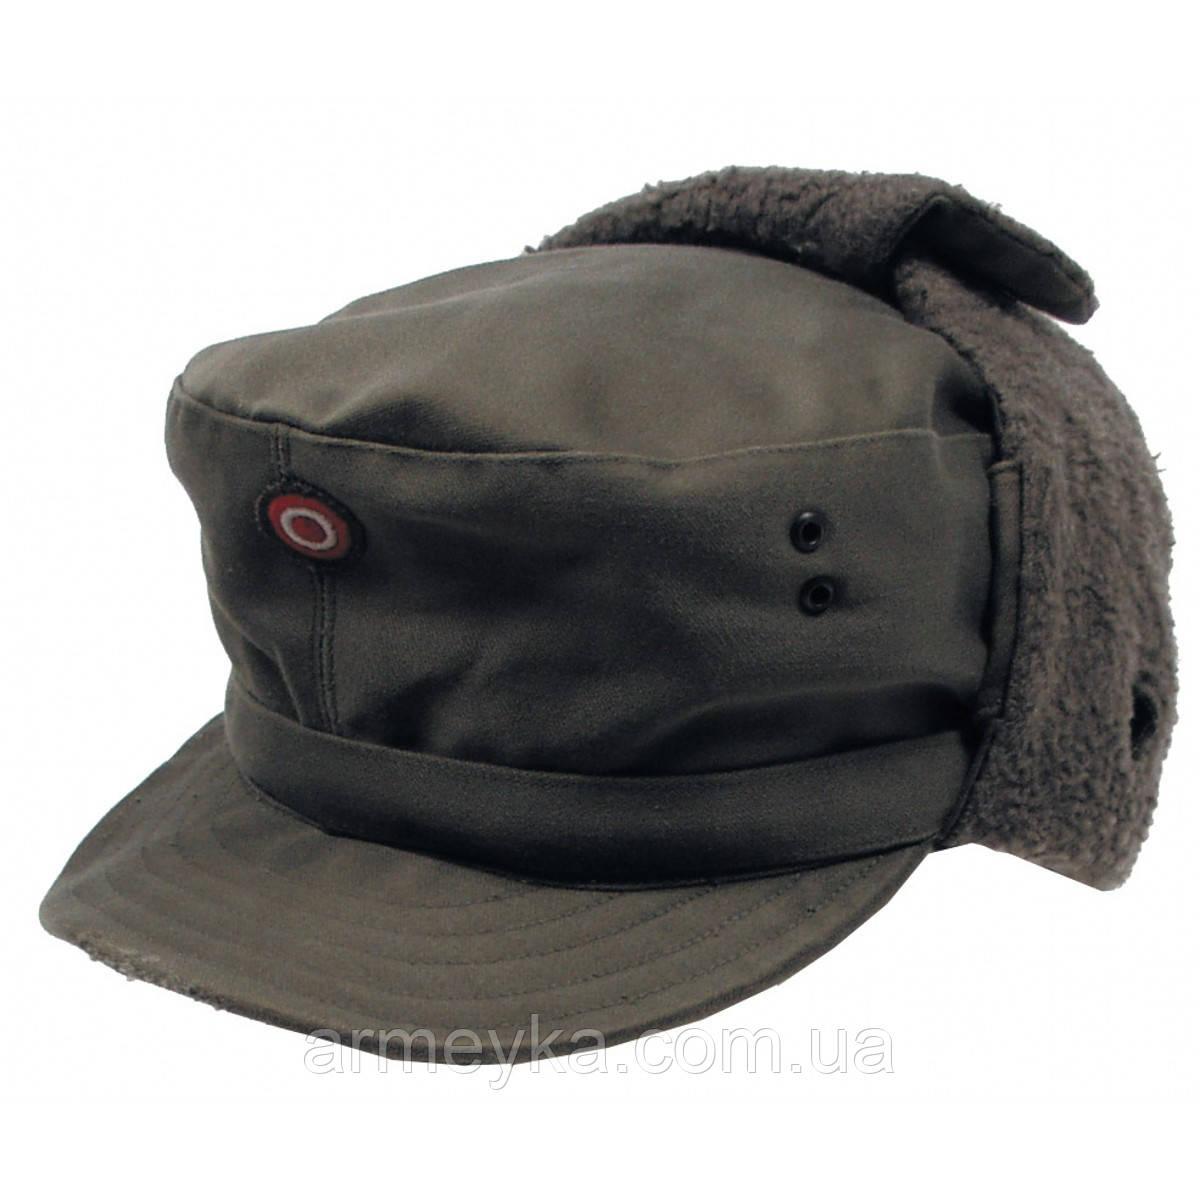 Зимняя шапка (кепи), олива. ВС Австрии, оригинал. 1-й сорт.